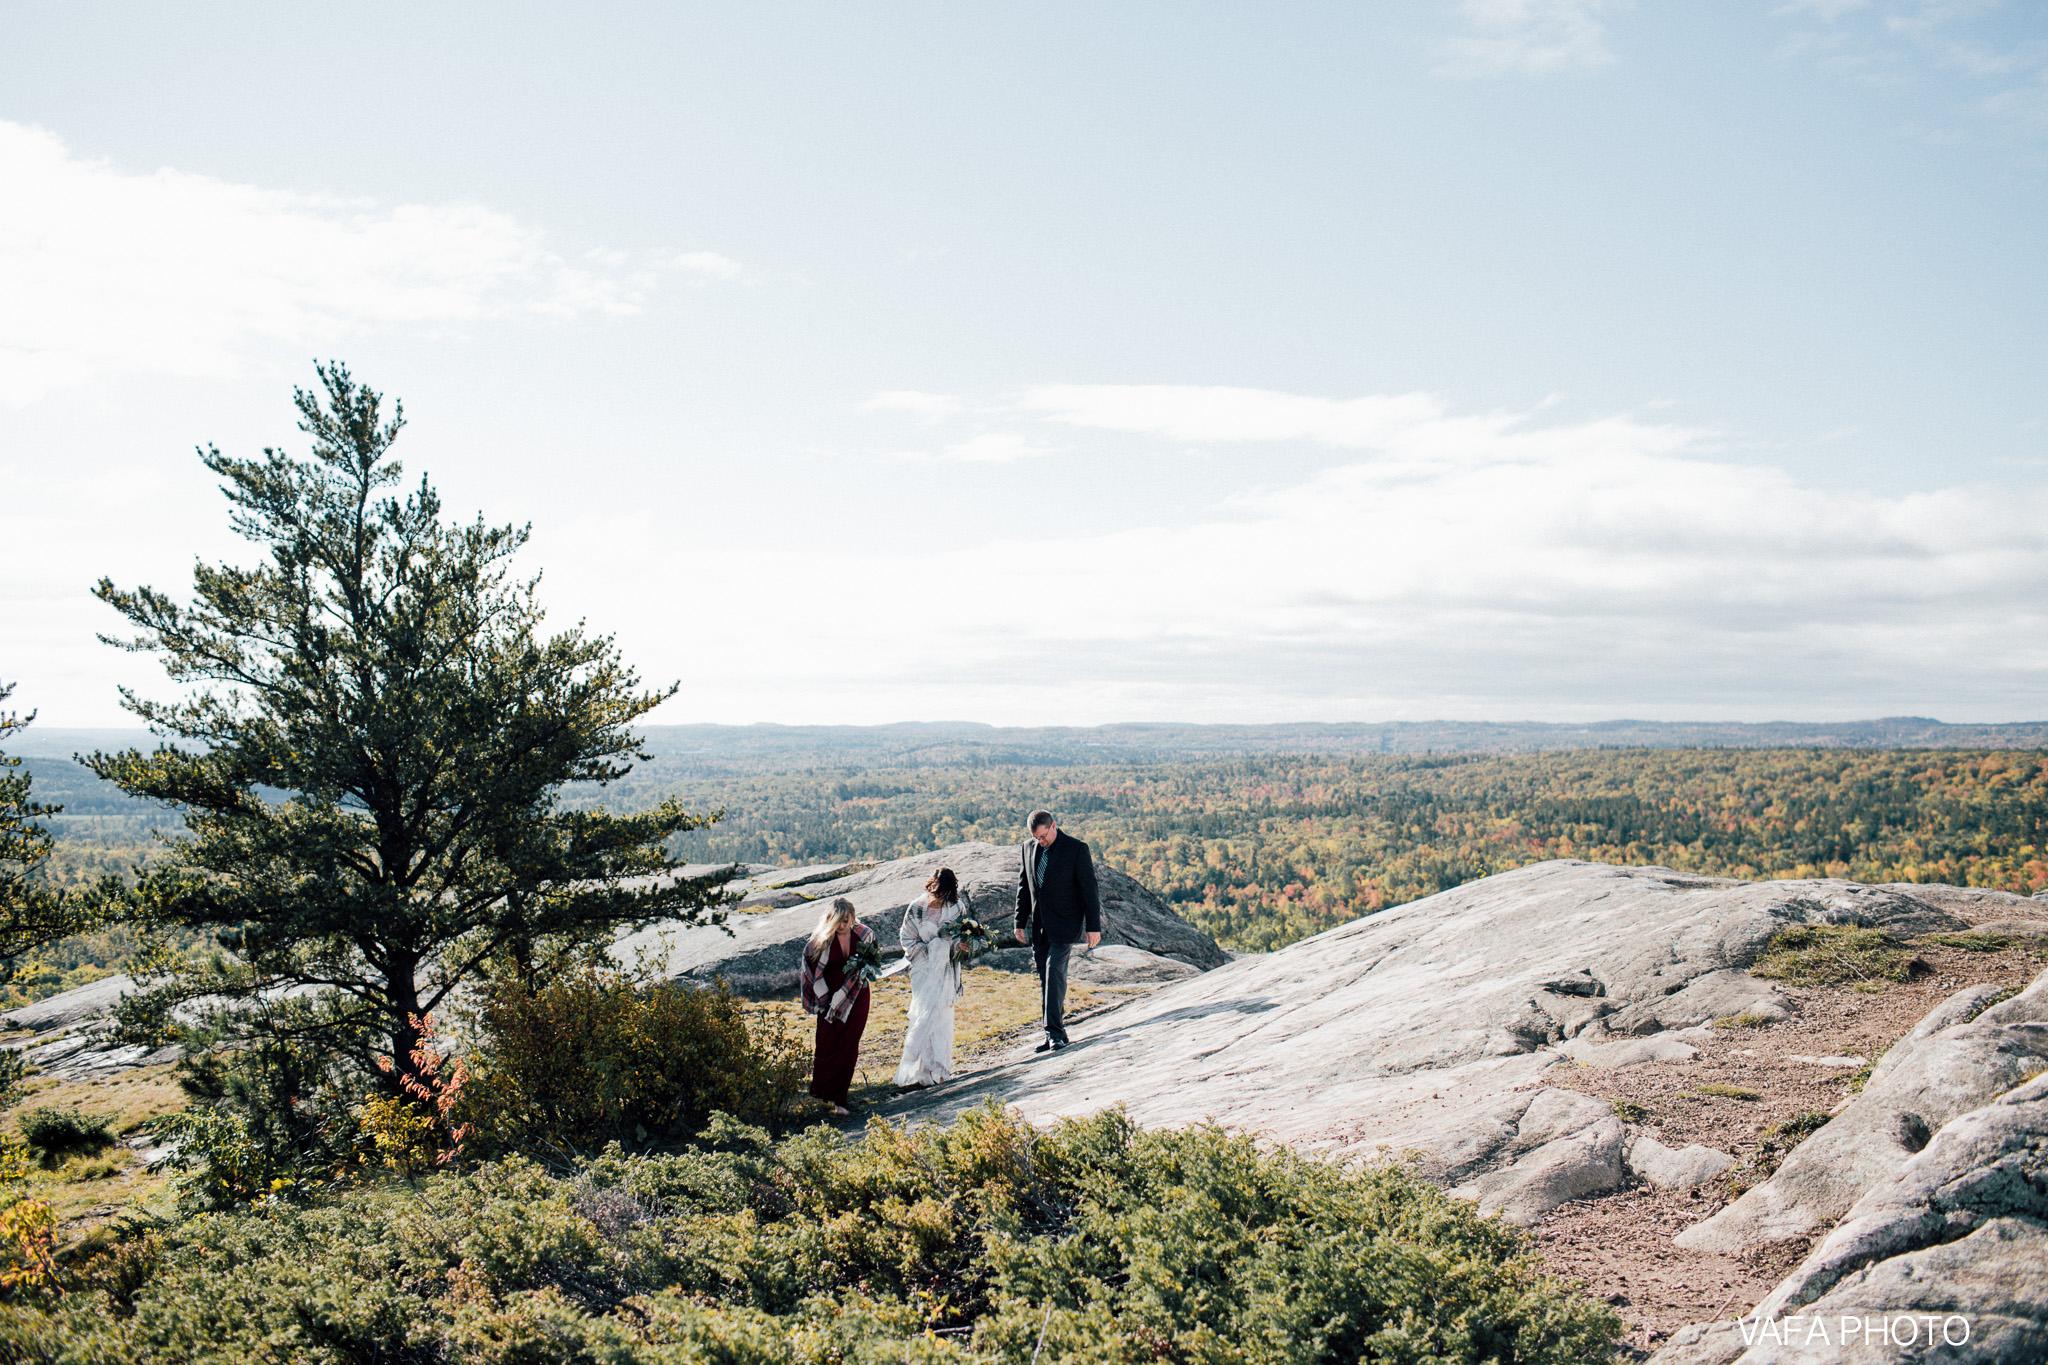 Hogback-Mountain-Wedding-Chelsea-Josh-Vafa-Photo-169.jpg